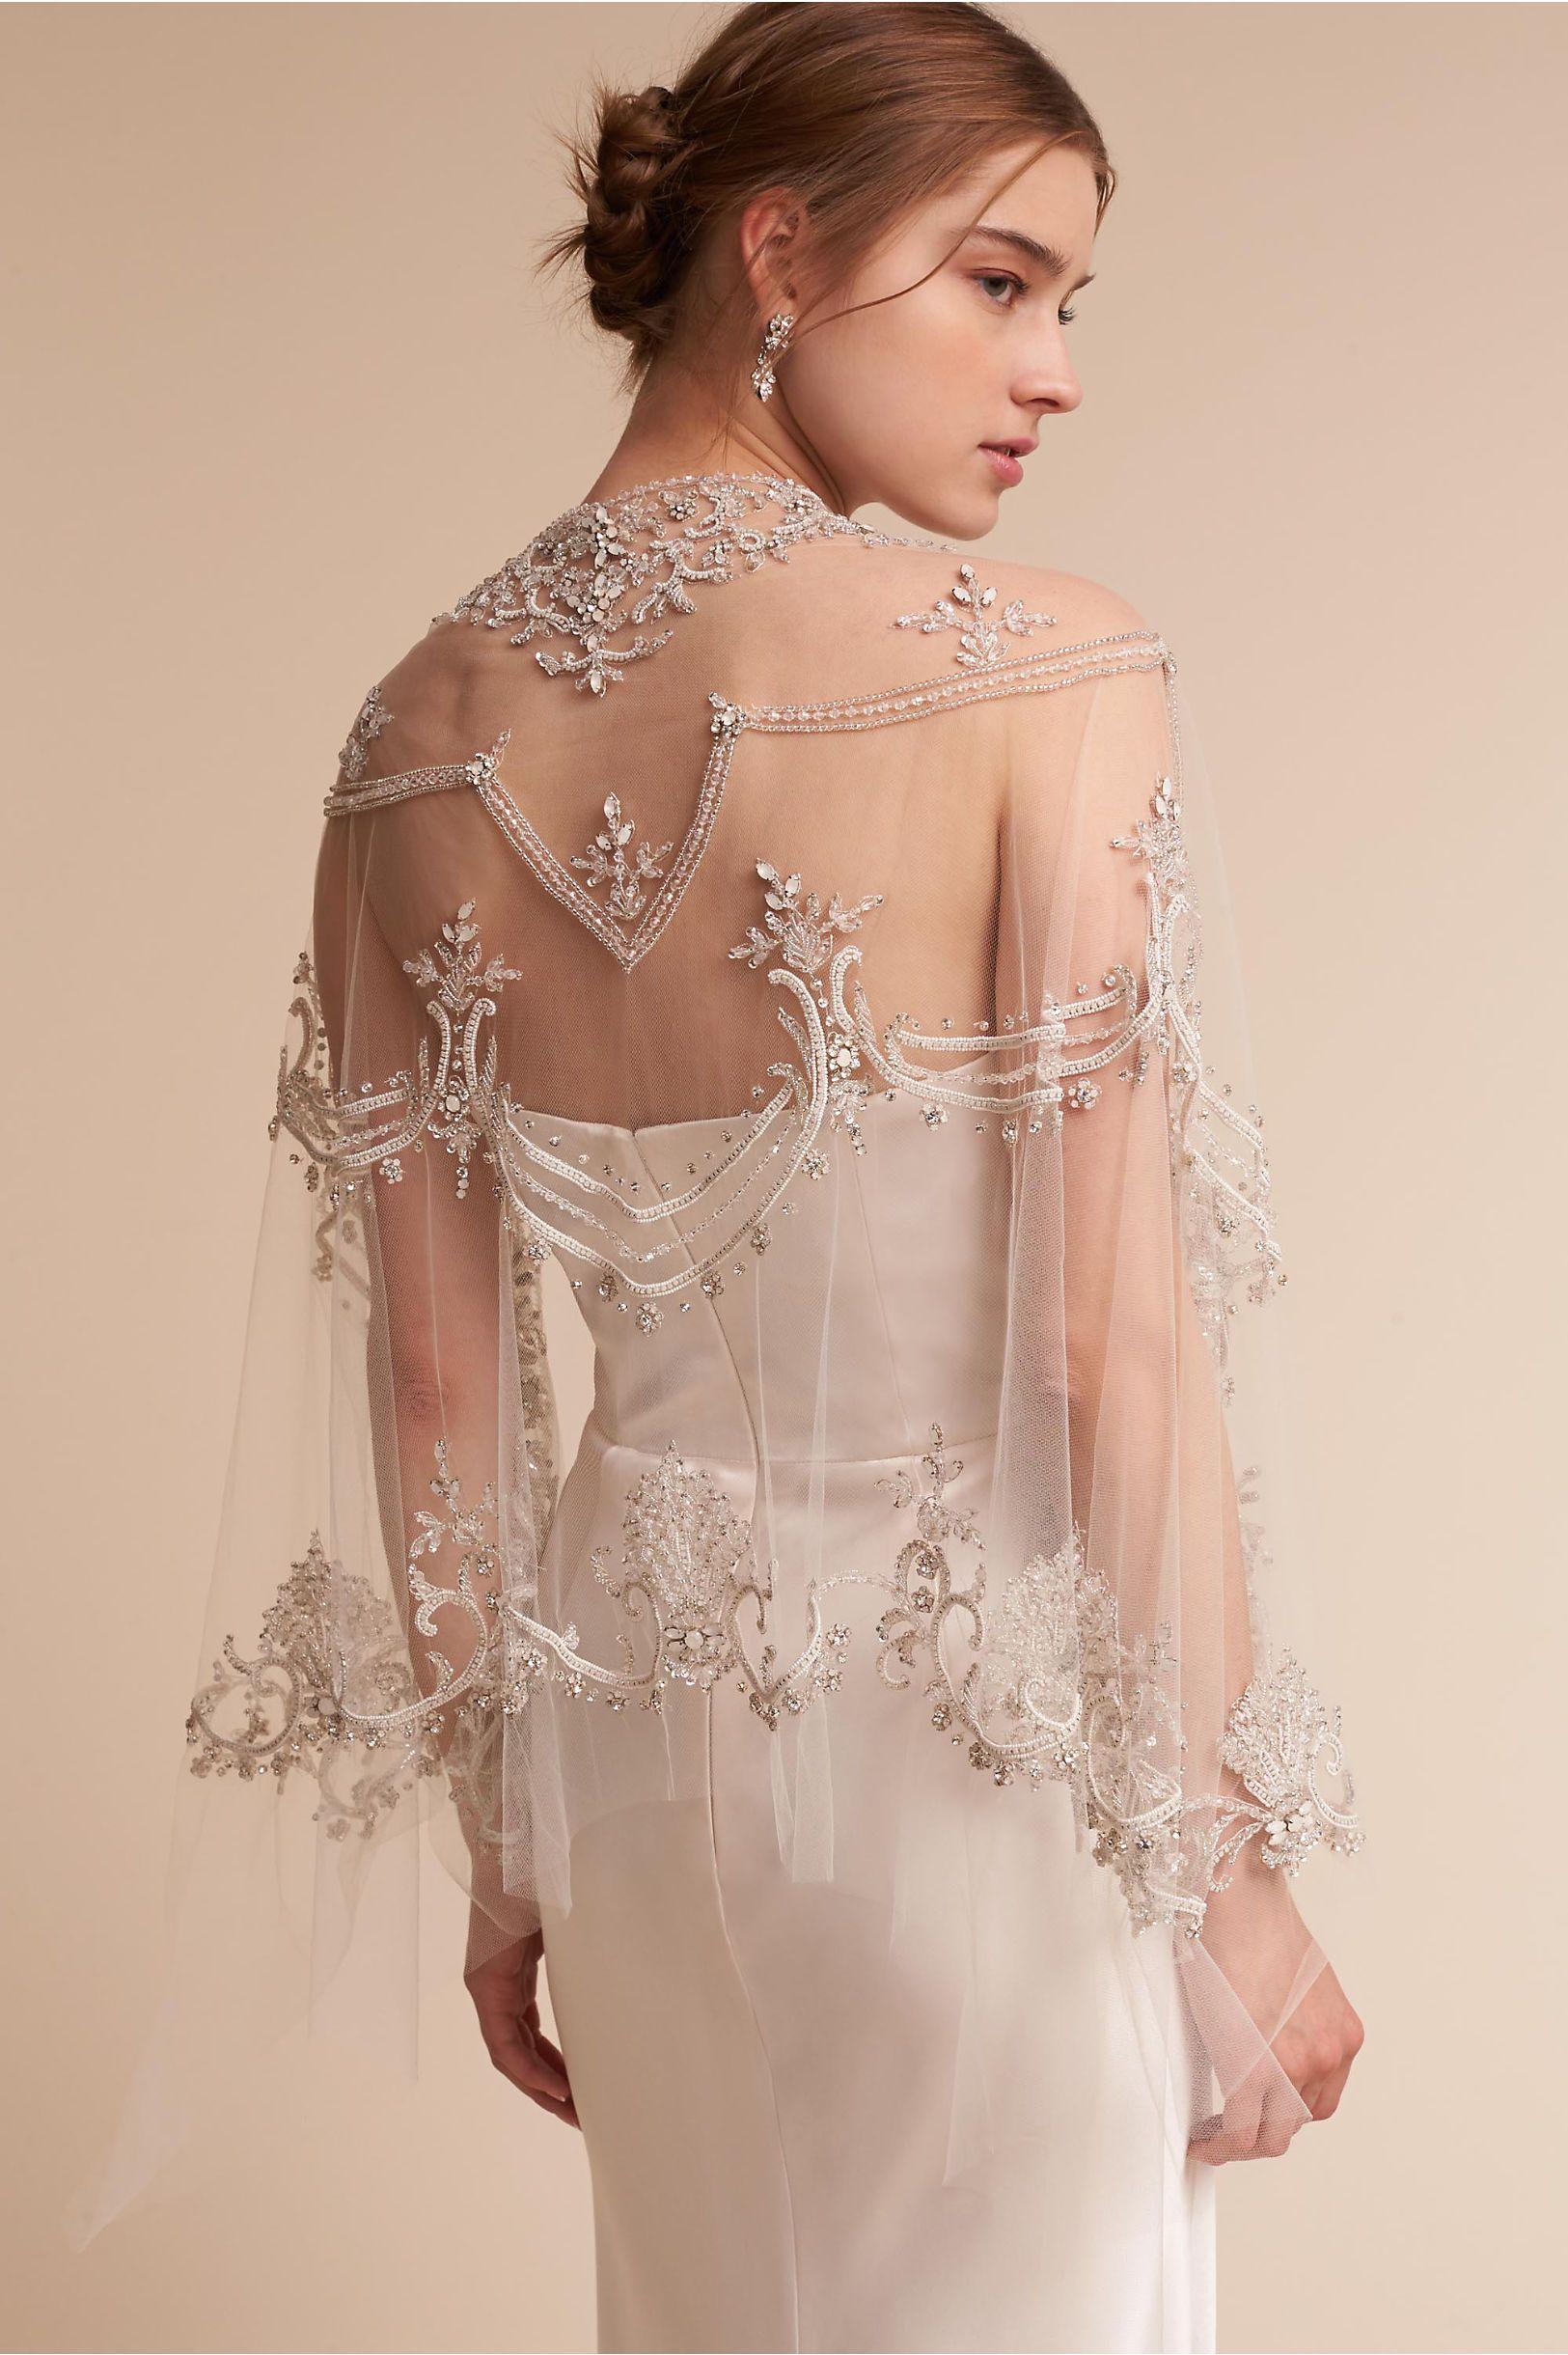 BHLDN Silver Elyria Cape in New | BHLDN | Attractive, Wedding, Prom ...